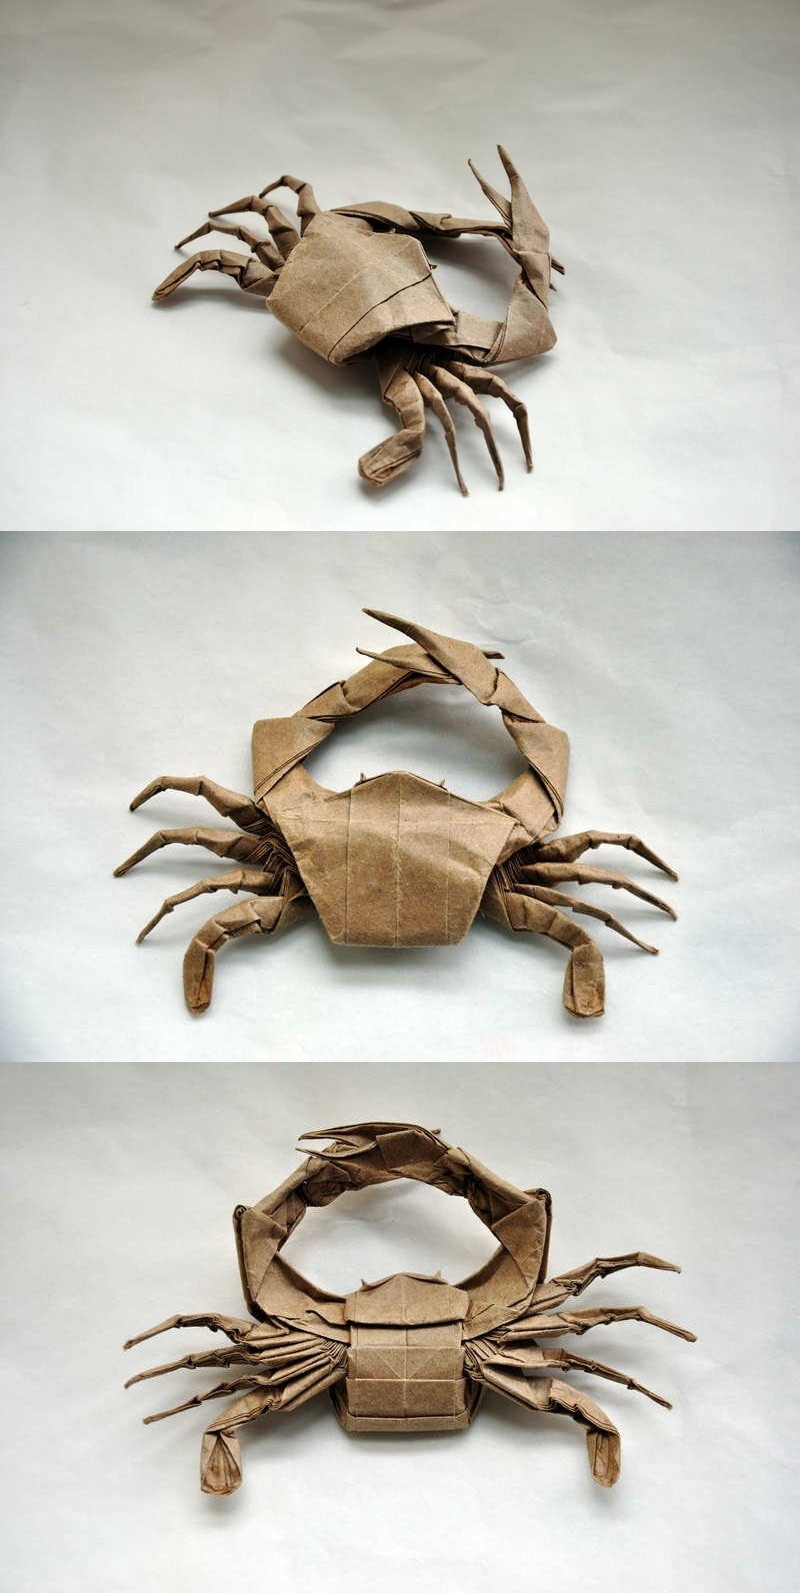 Jason Ku's Crab